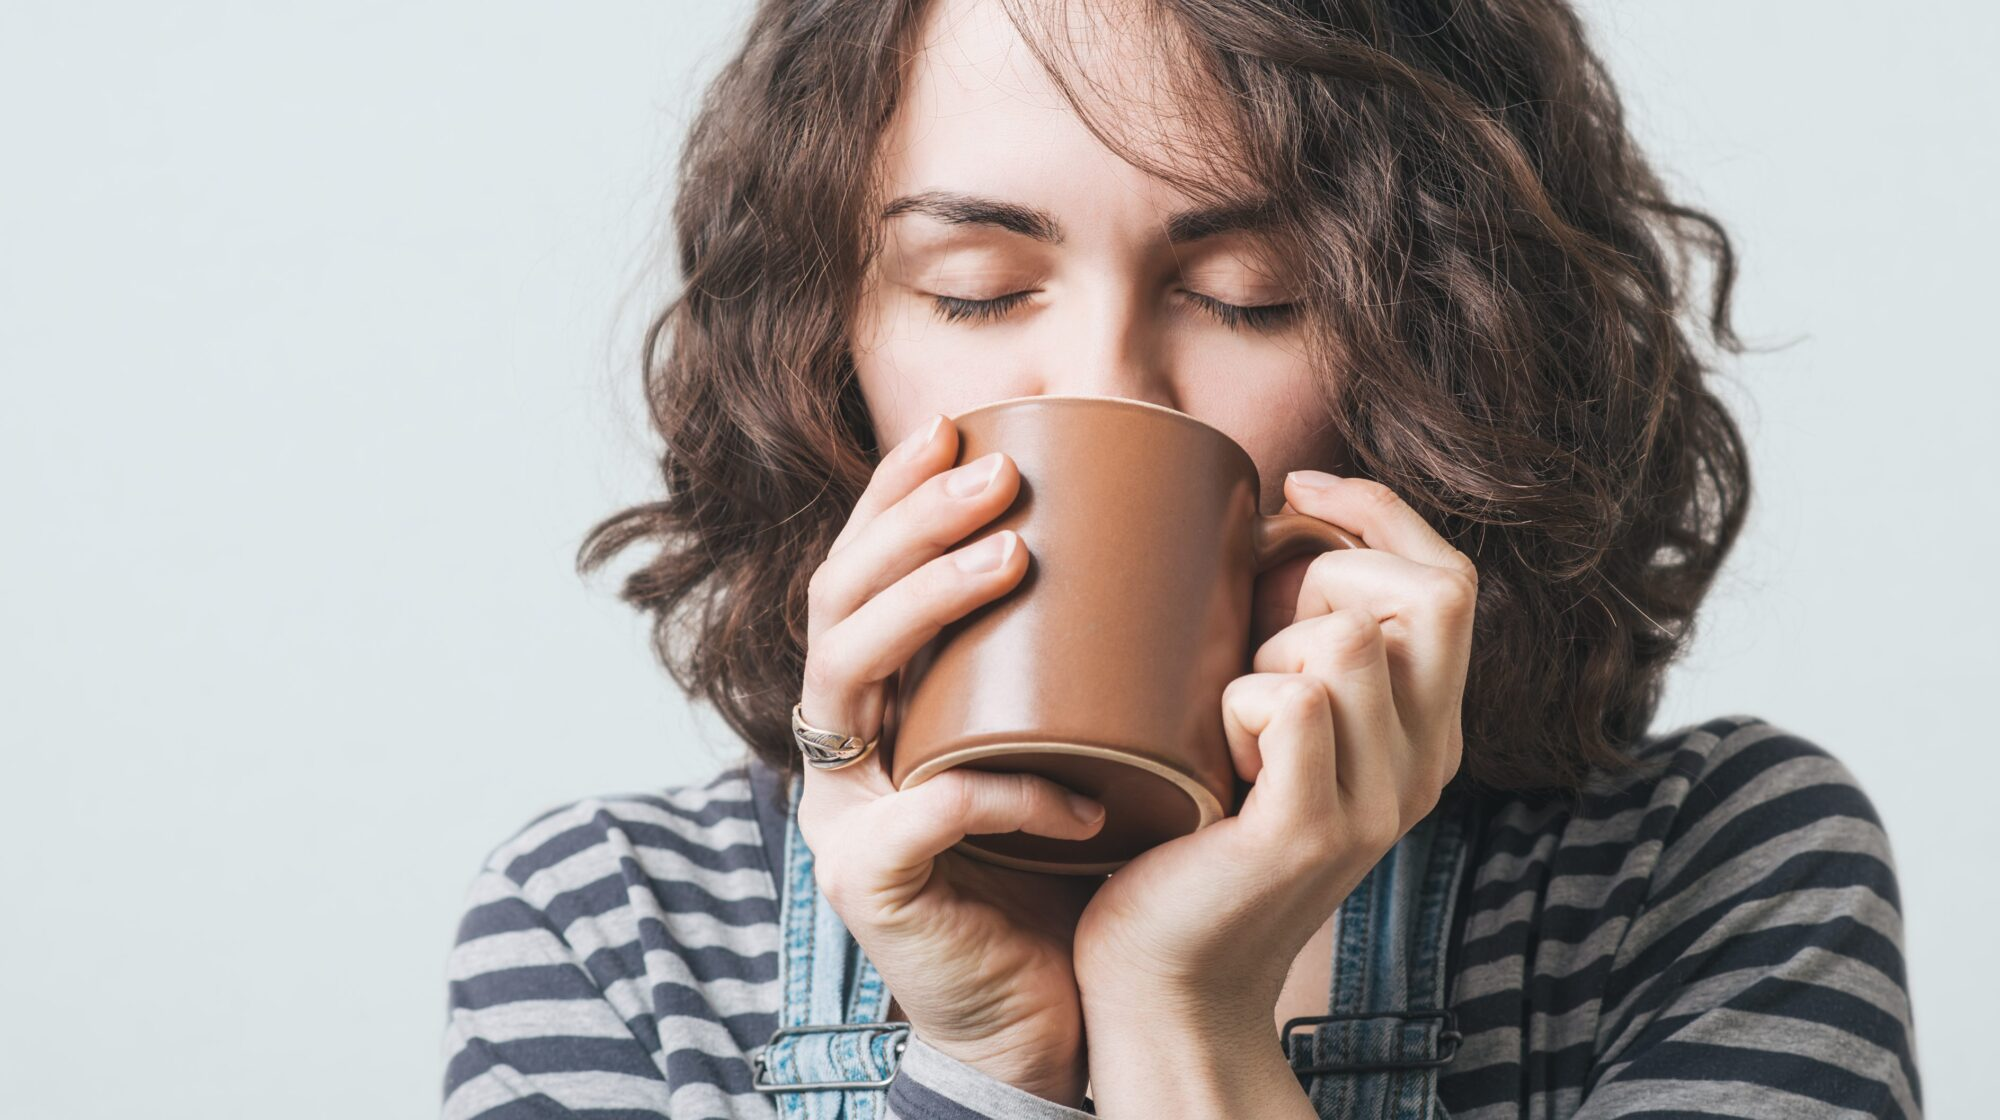 Nederlanders drinken gemiddeld 4,1 kopjes koffie per dag